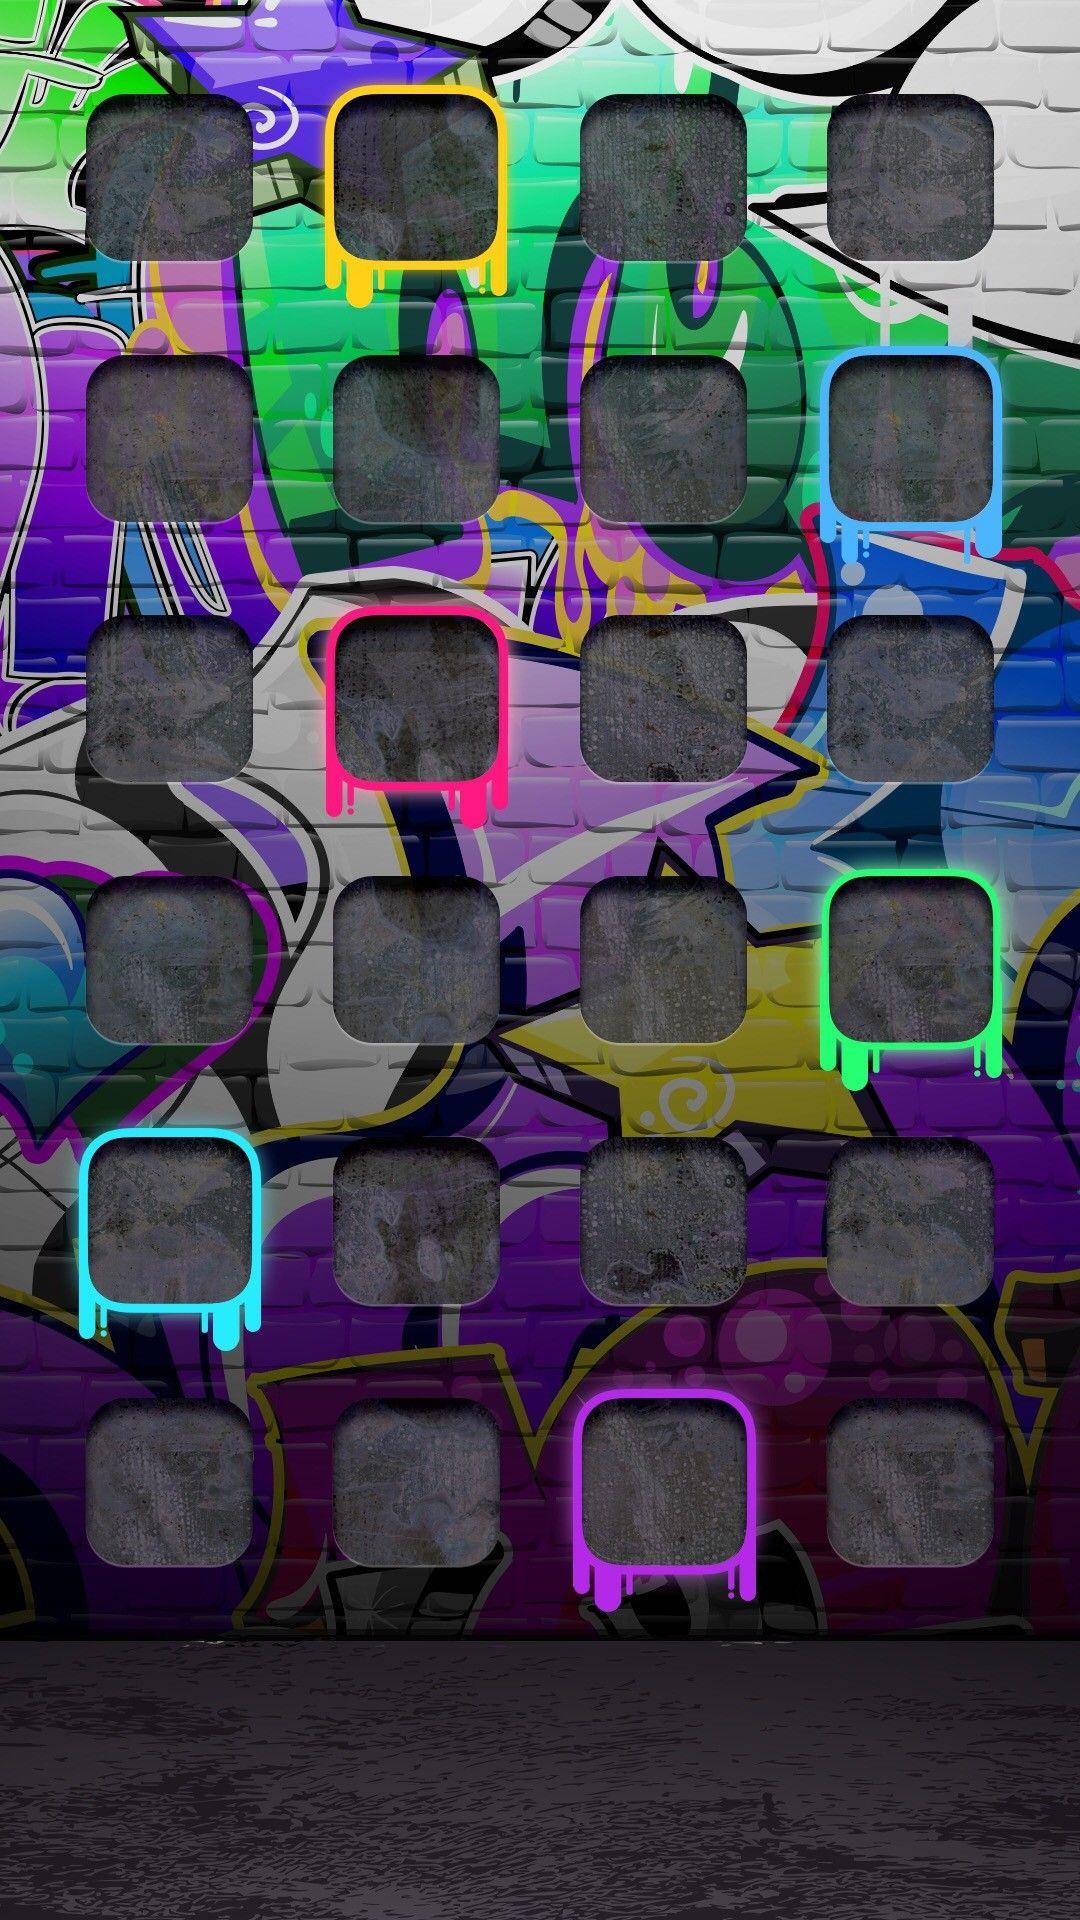 Kaws Iphone Xr Wallpapers Wallpaper Cave